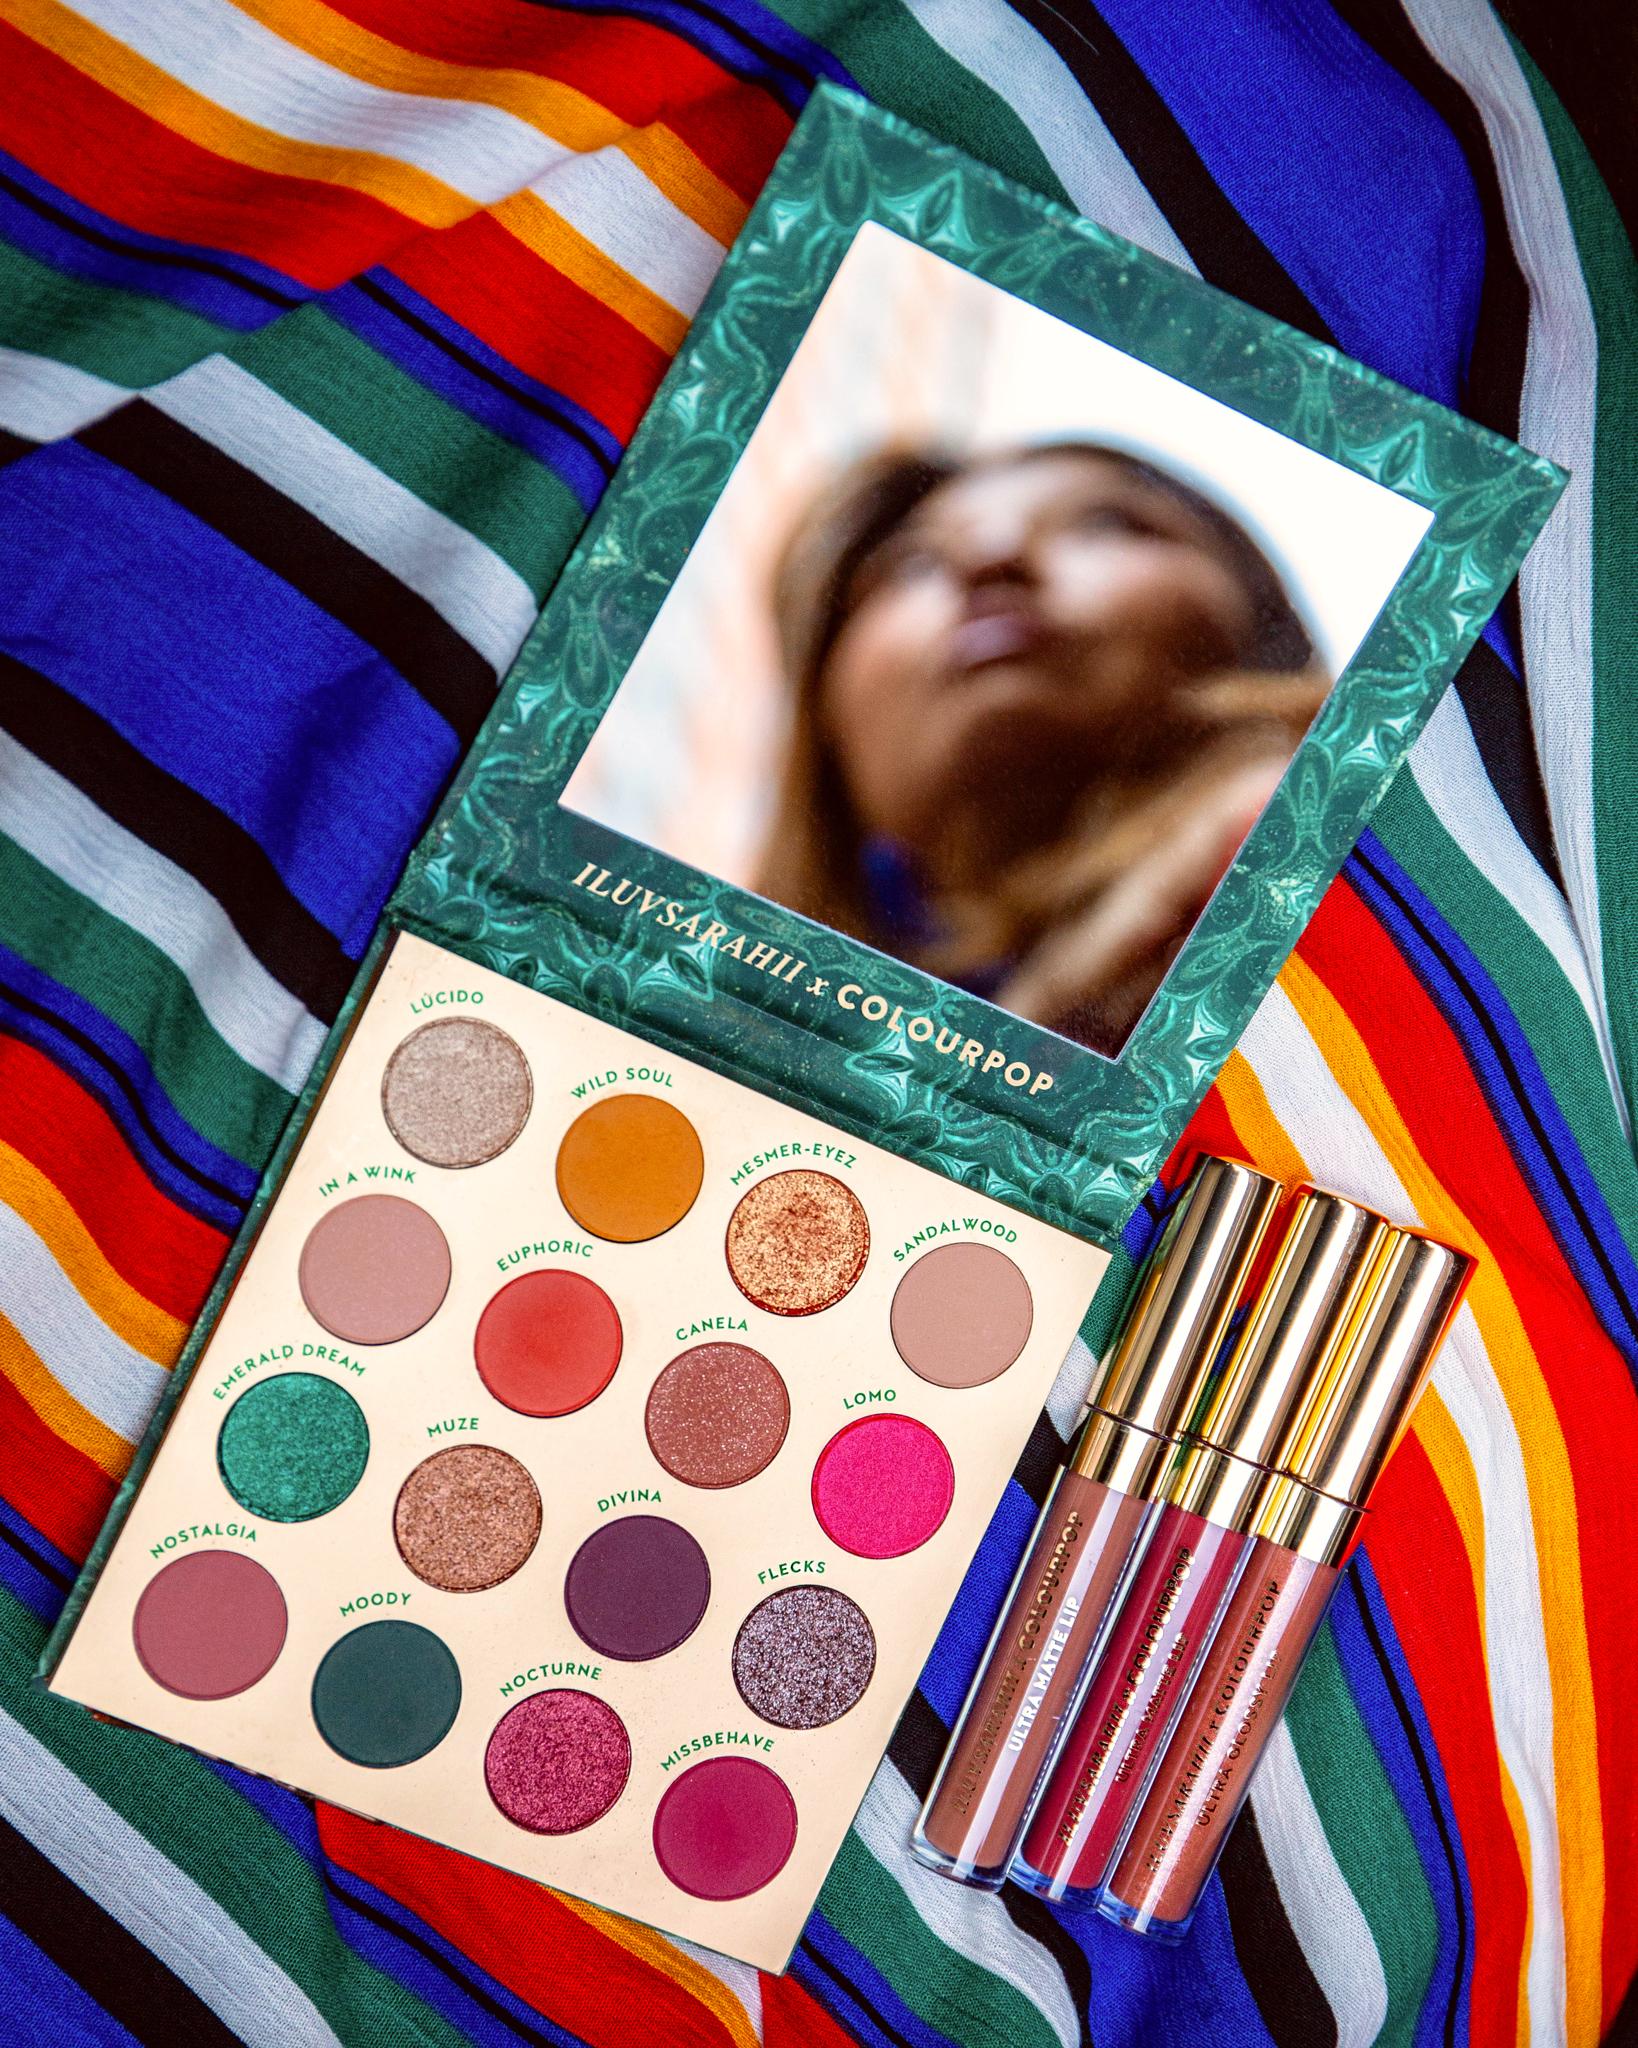 Colourpop iluvsarahii palette